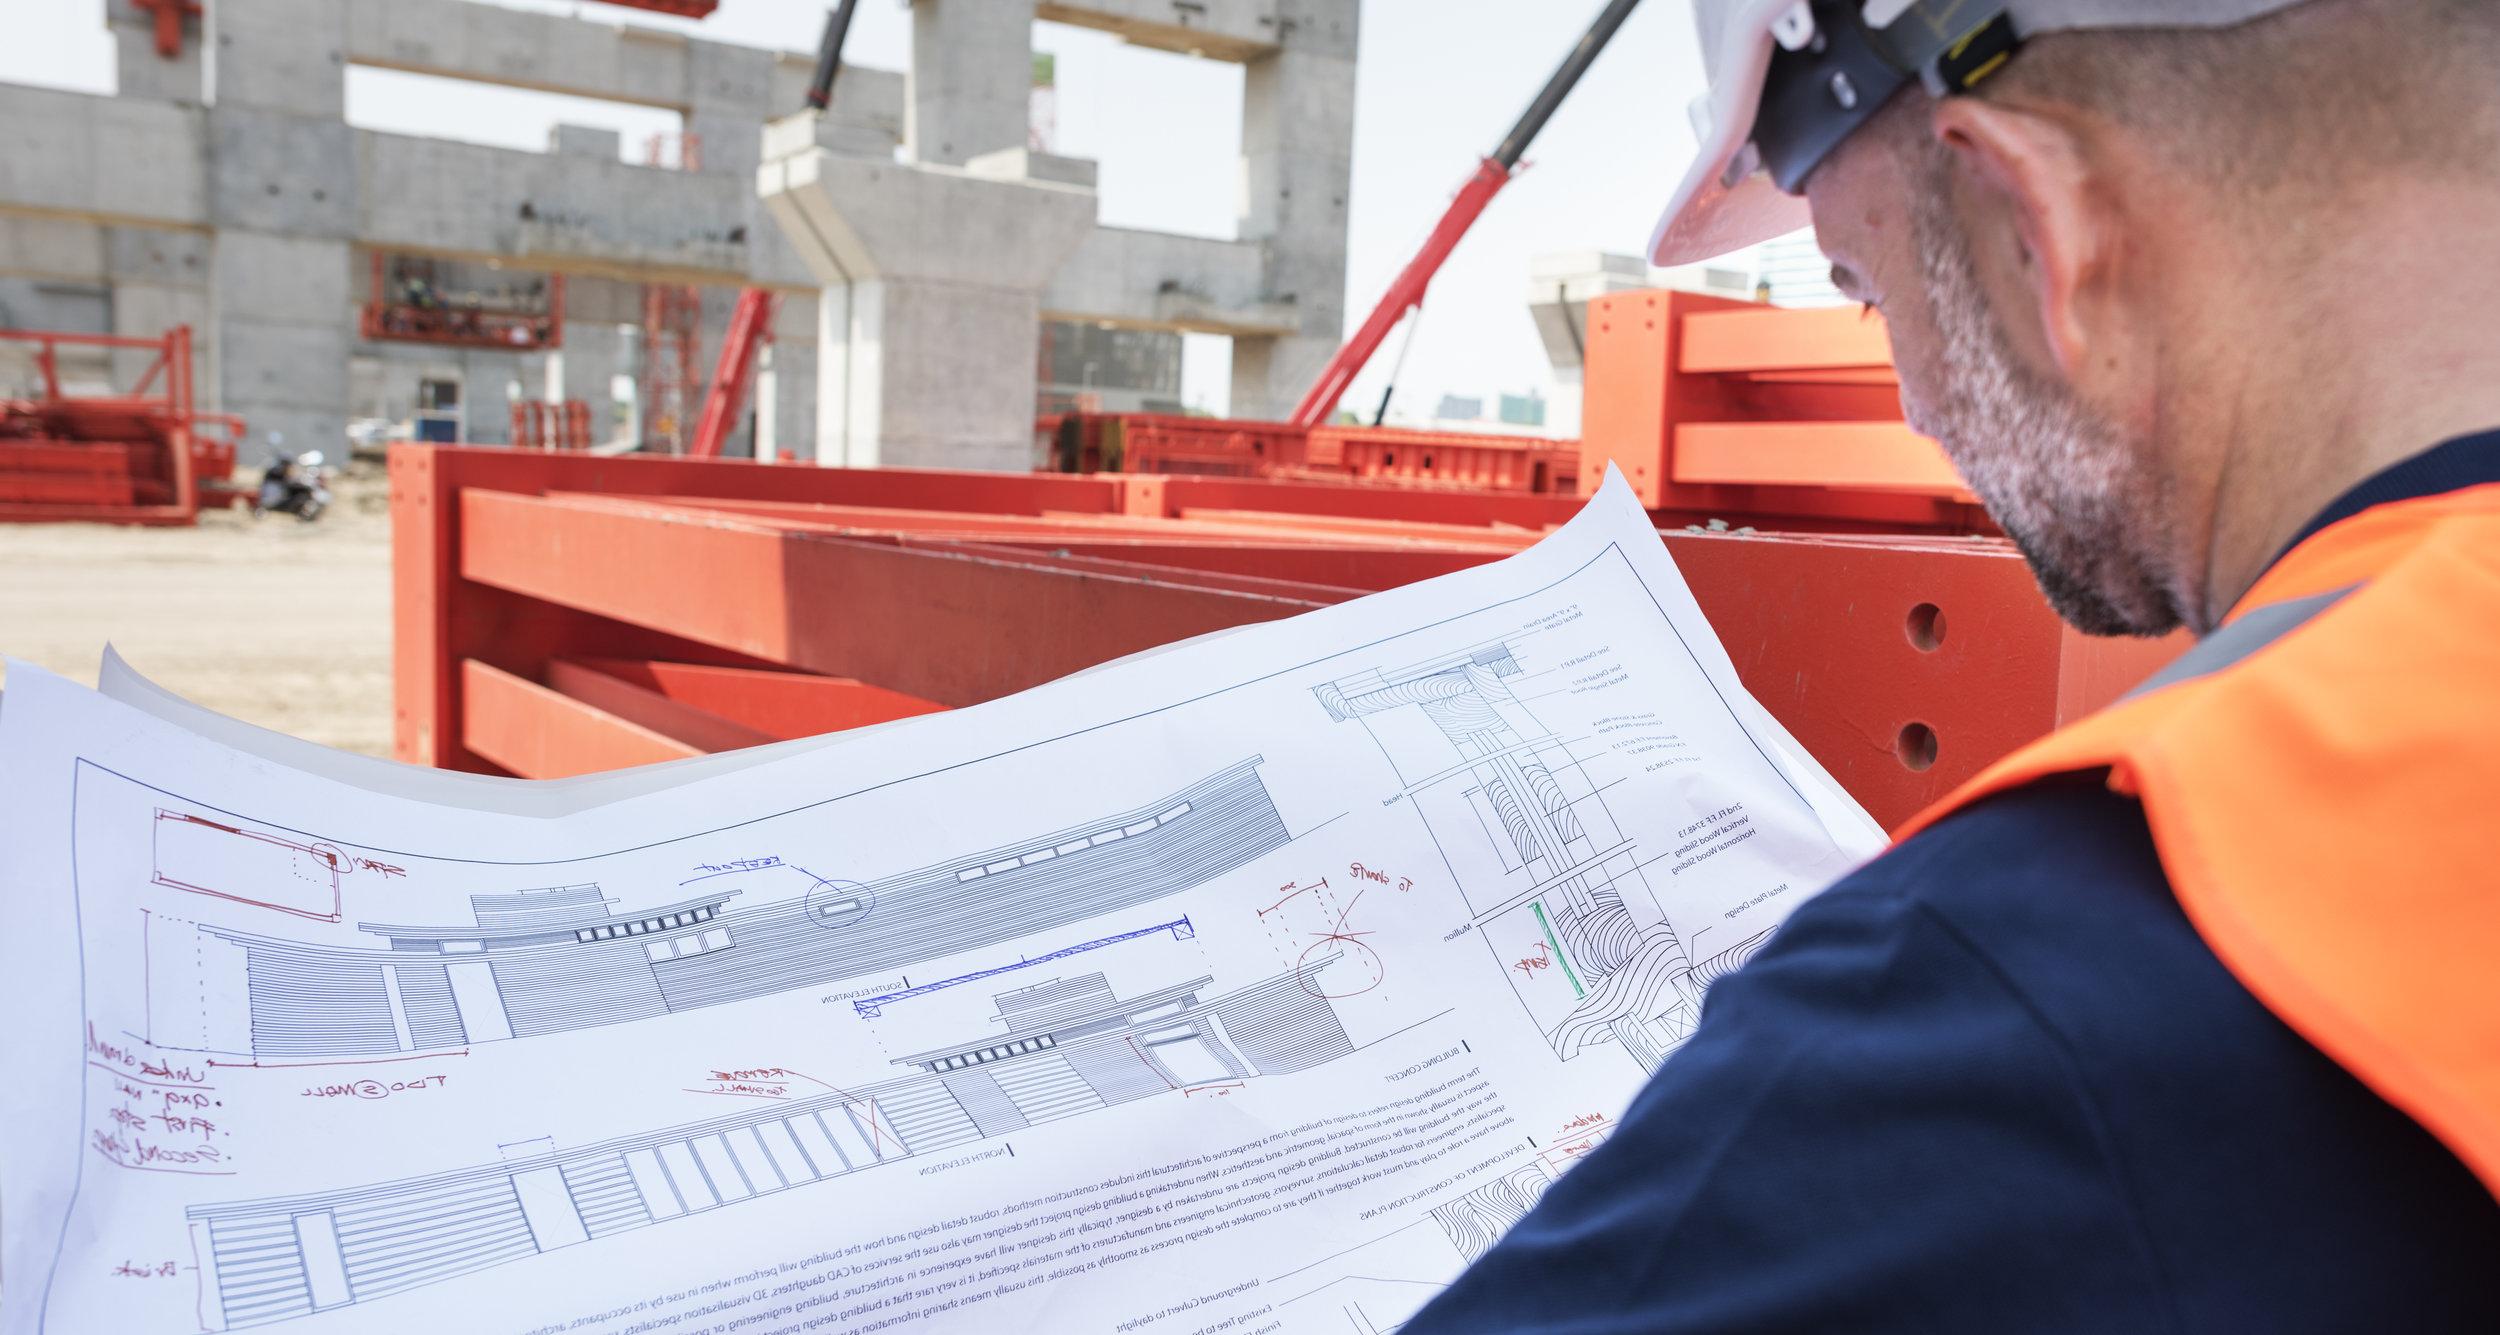 blueprint-architect-career-structure-construction-PABL5BP.jpg